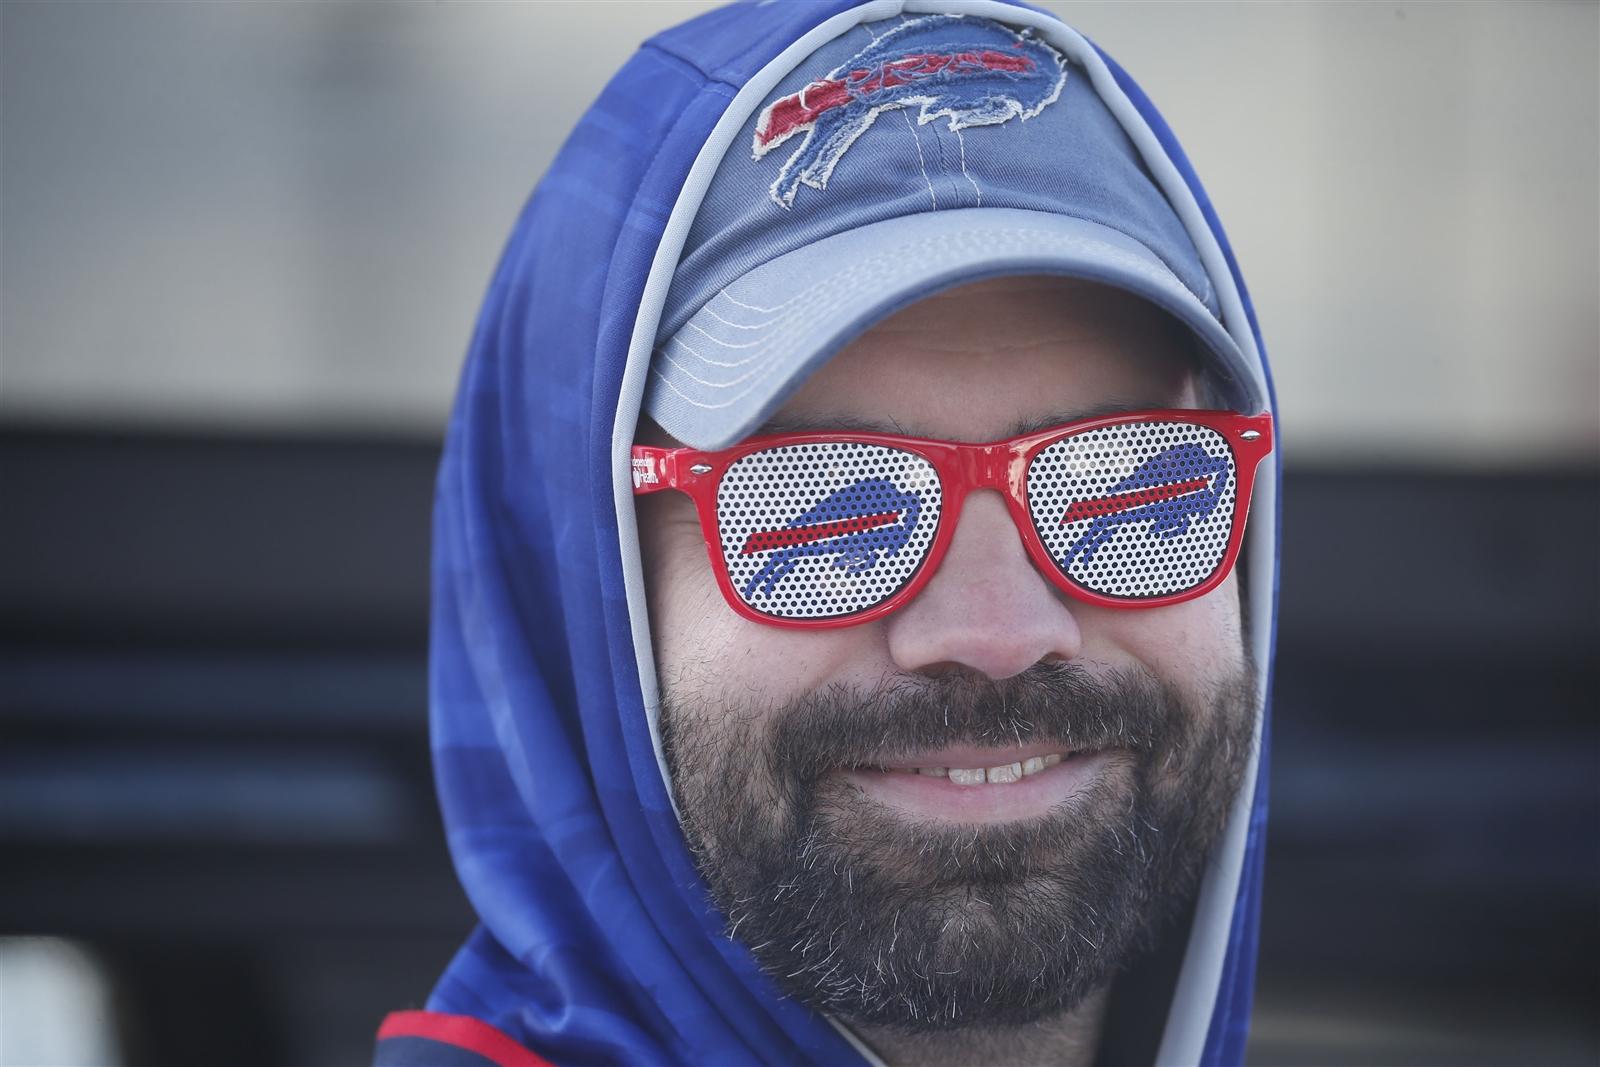 Curtis Panful of Hamburg wore his favorite shades to Sunday's Bills-Jaguars game. (Robert Kirkham/Buffalo News)